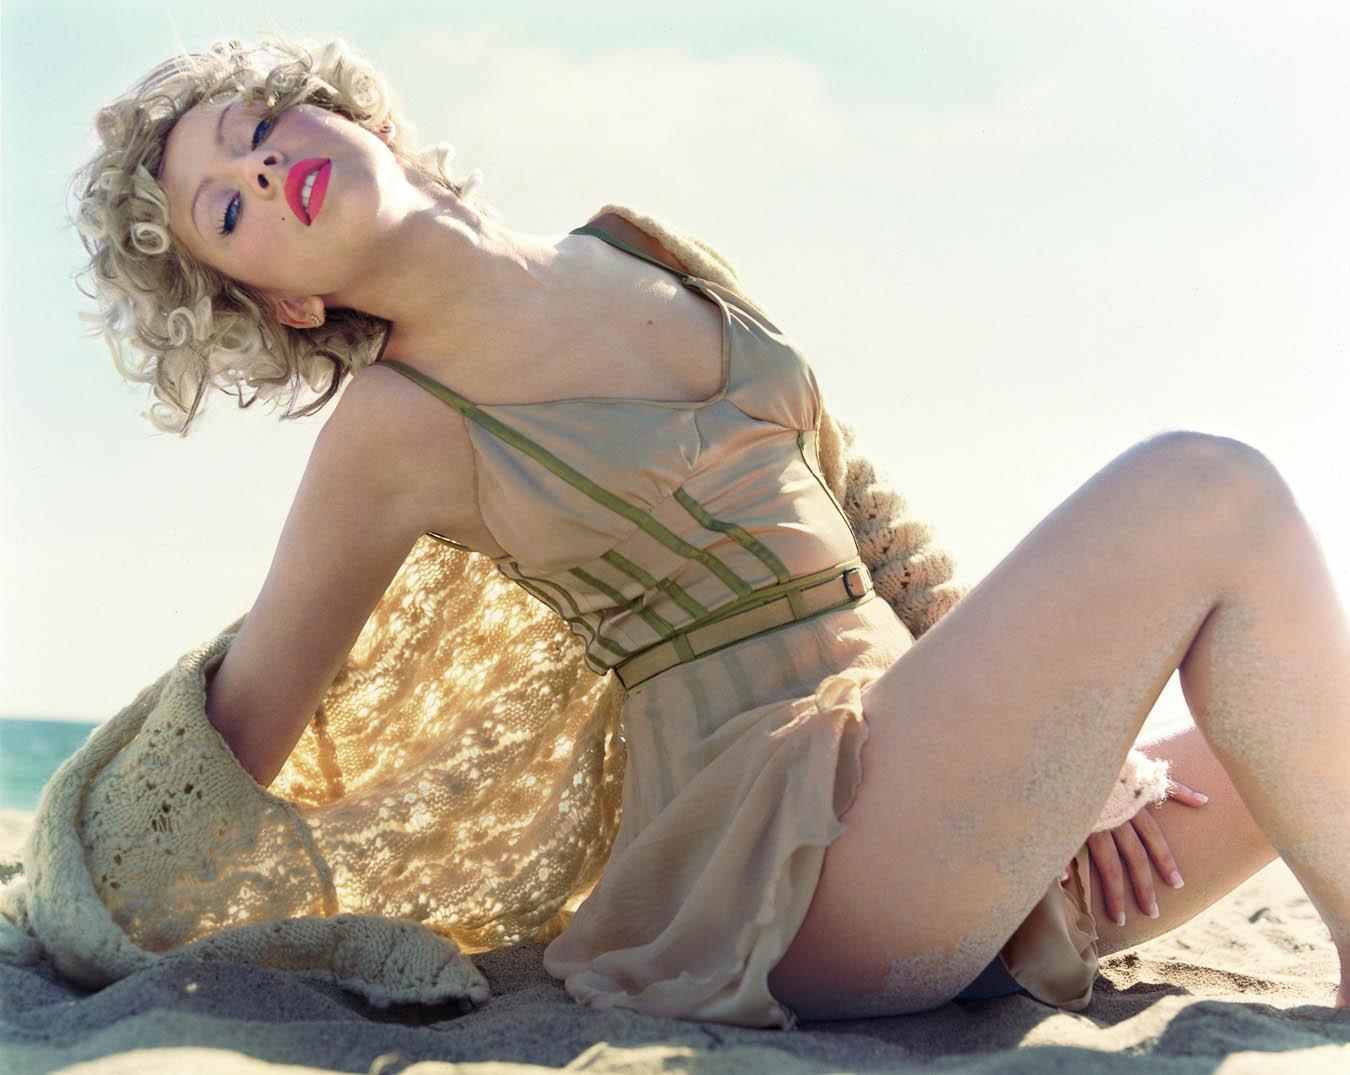 http://1.bp.blogspot.com/_hZhRJKi4uPk/TFLpU6TVyaI/AAAAAAAAAOE/6IKJjqKBTYQ/s1600/christina_aguilera_mag_blond_5_big.jpg